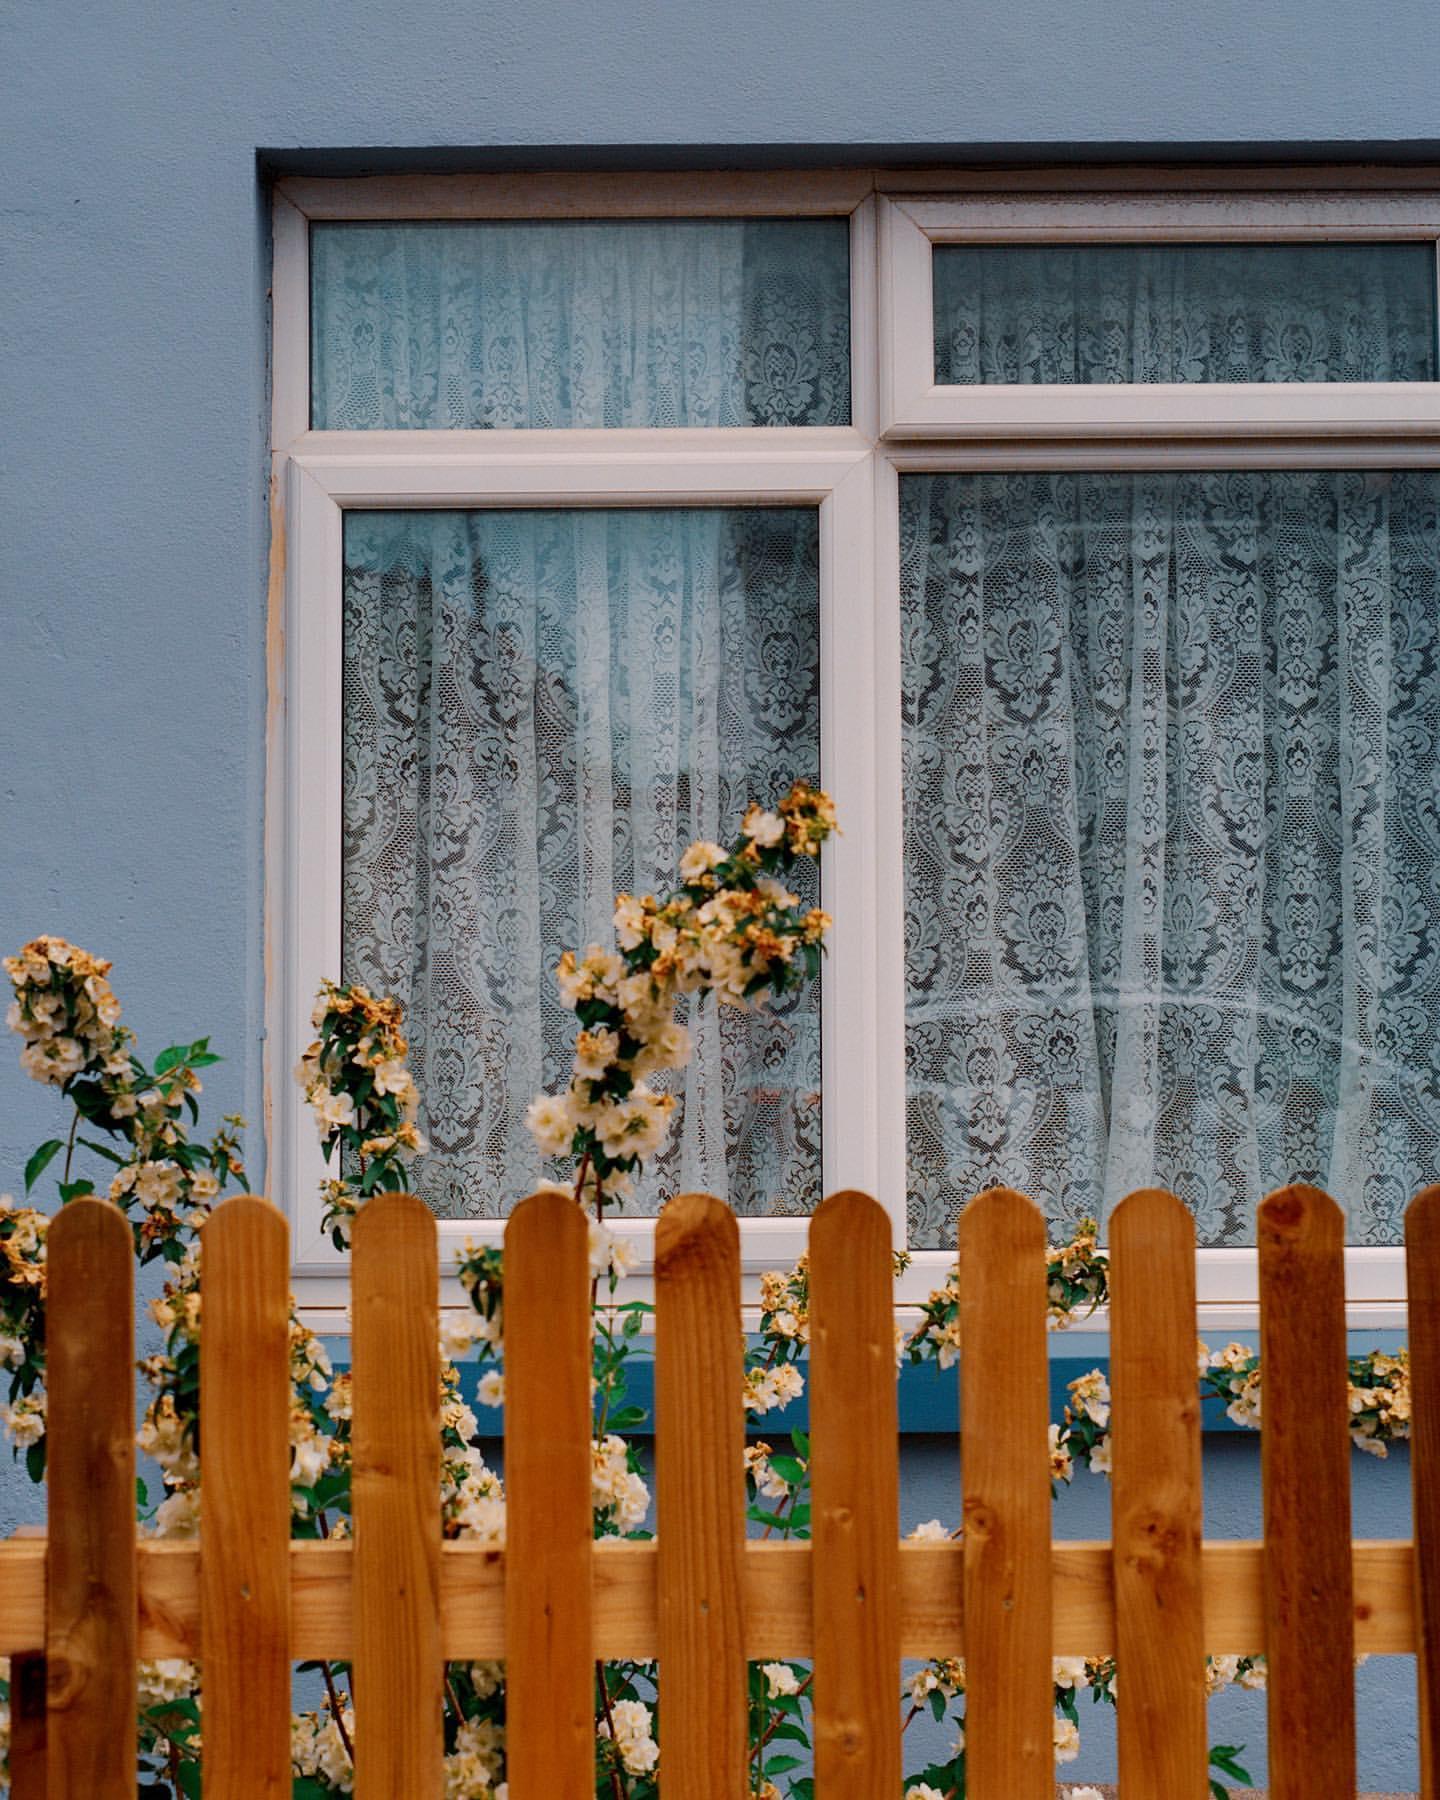 Great British Windows, Teddy Fitzhugh's photographic project